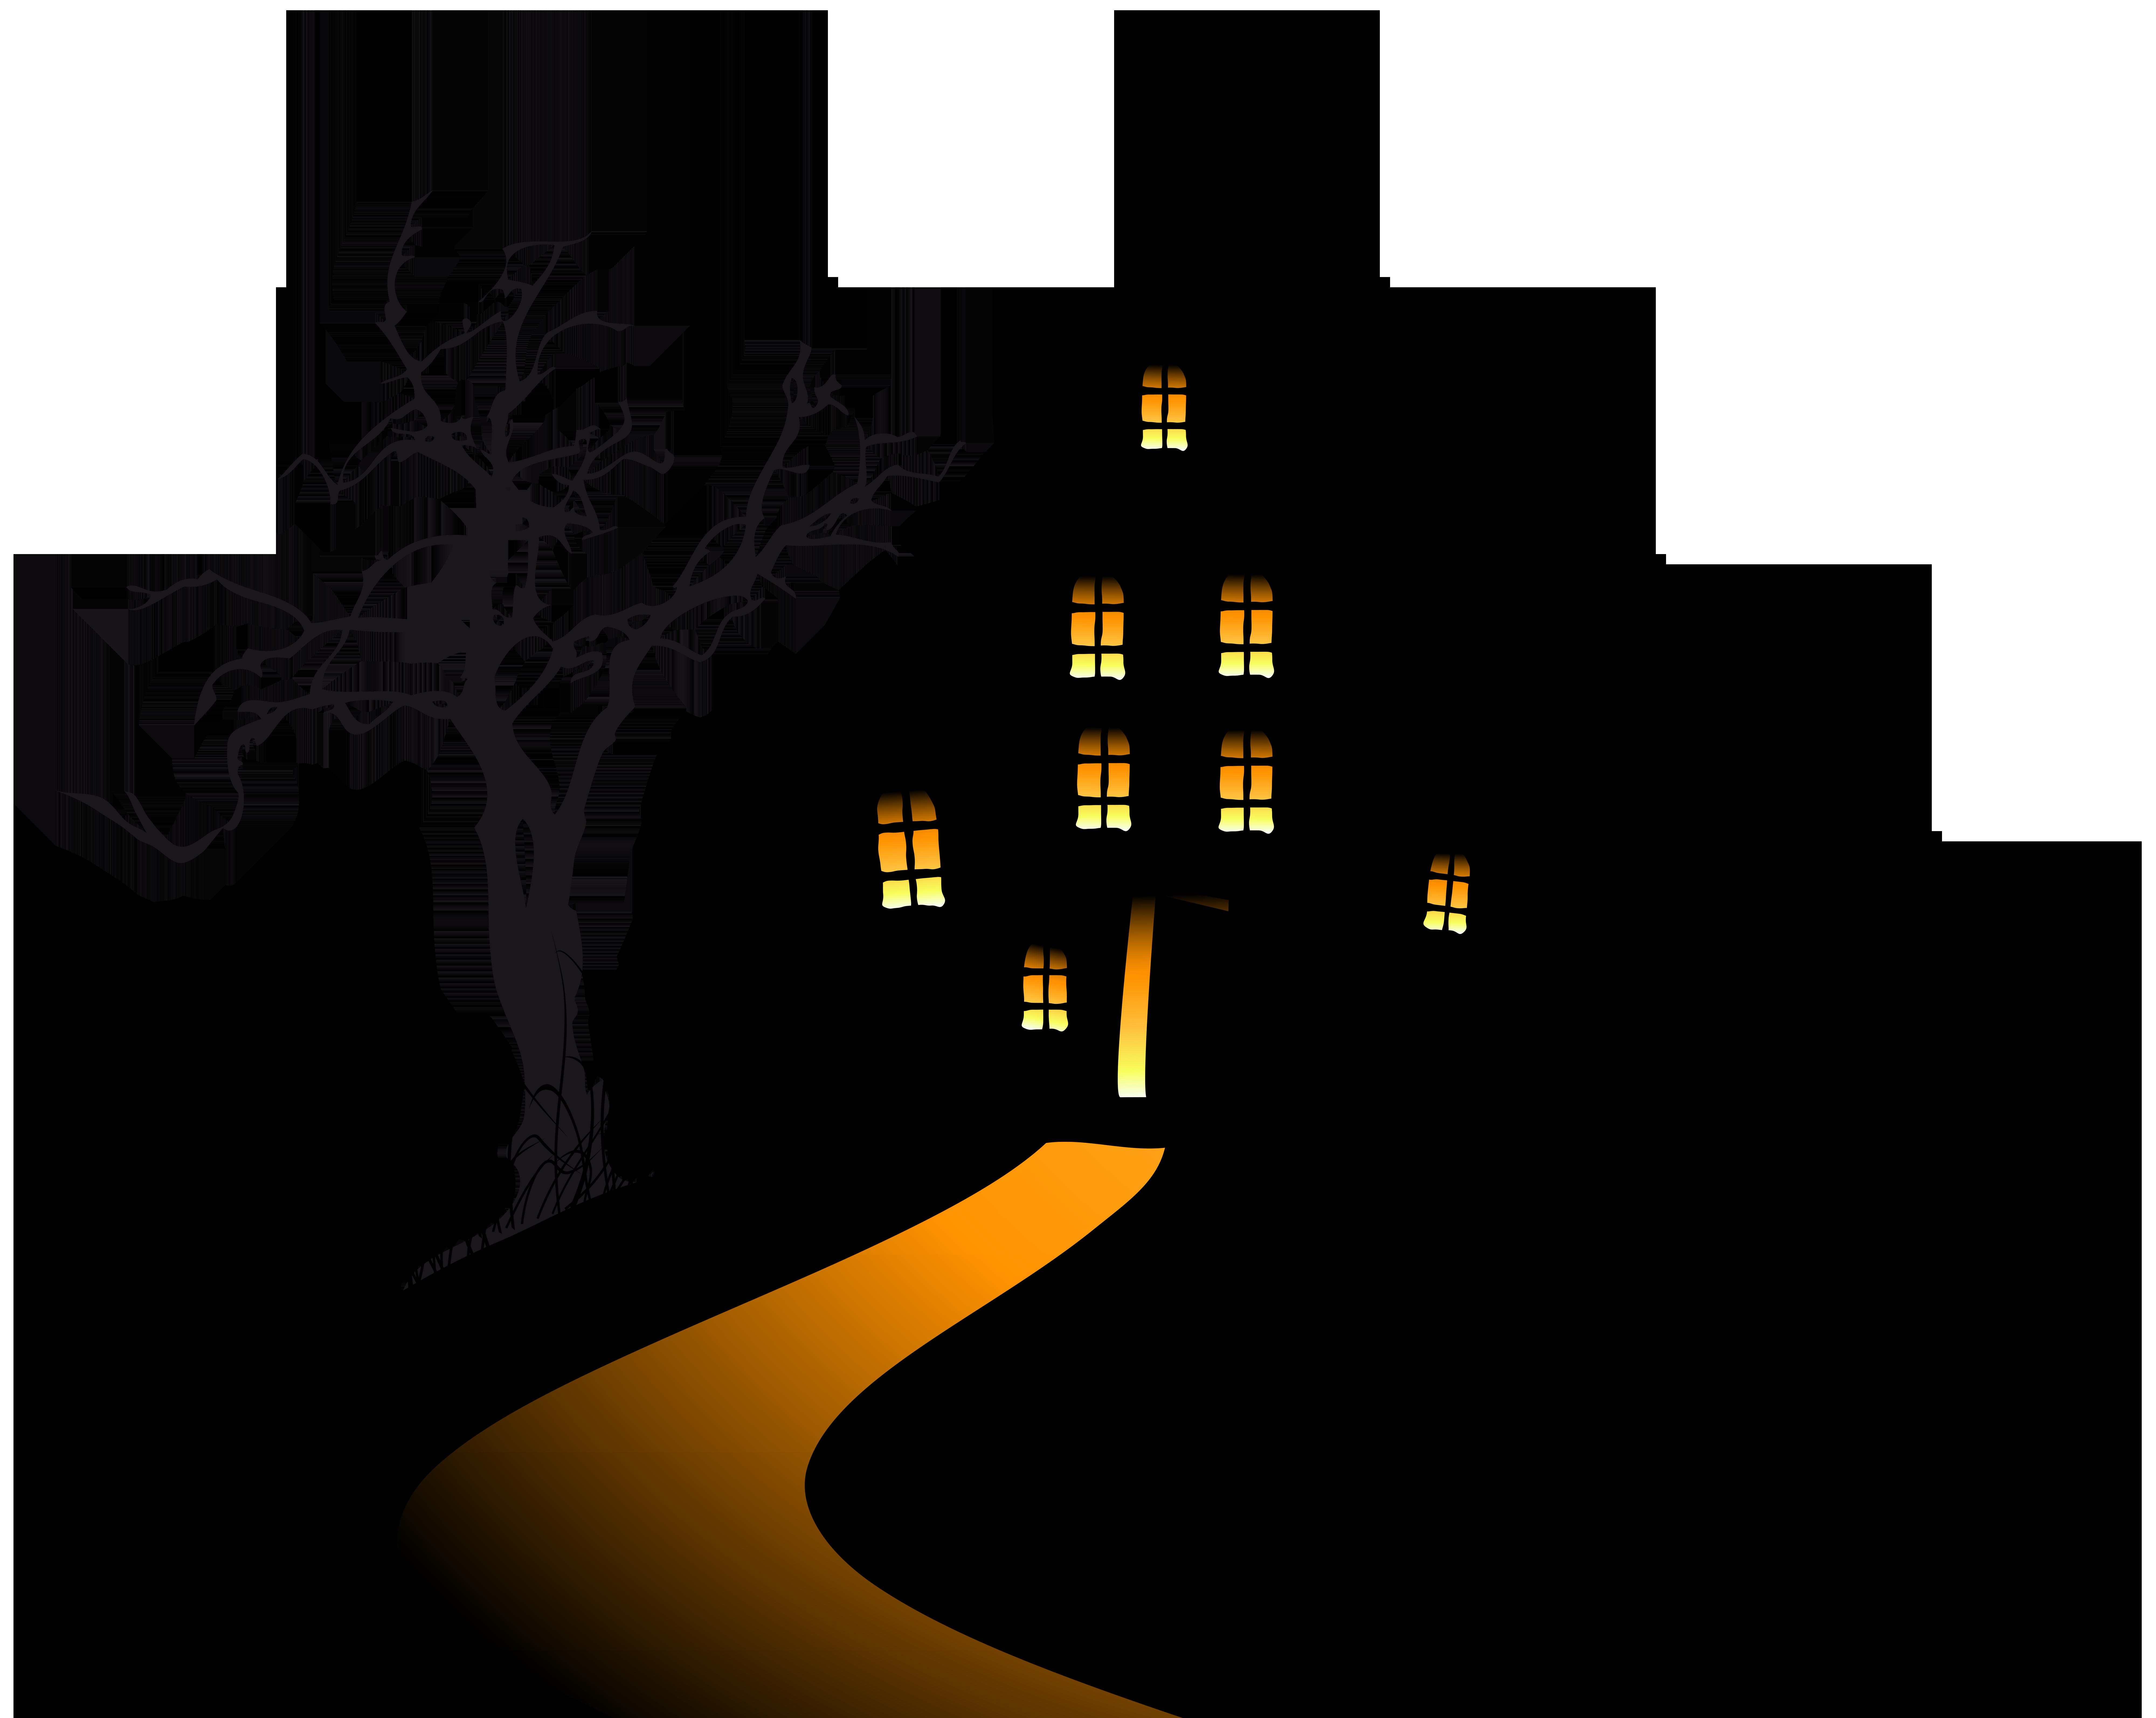 Creepy clipart svg royalty free stock Halloween Creepy Castle Clip Art Image | Gallery Yopriceville ... svg royalty free stock